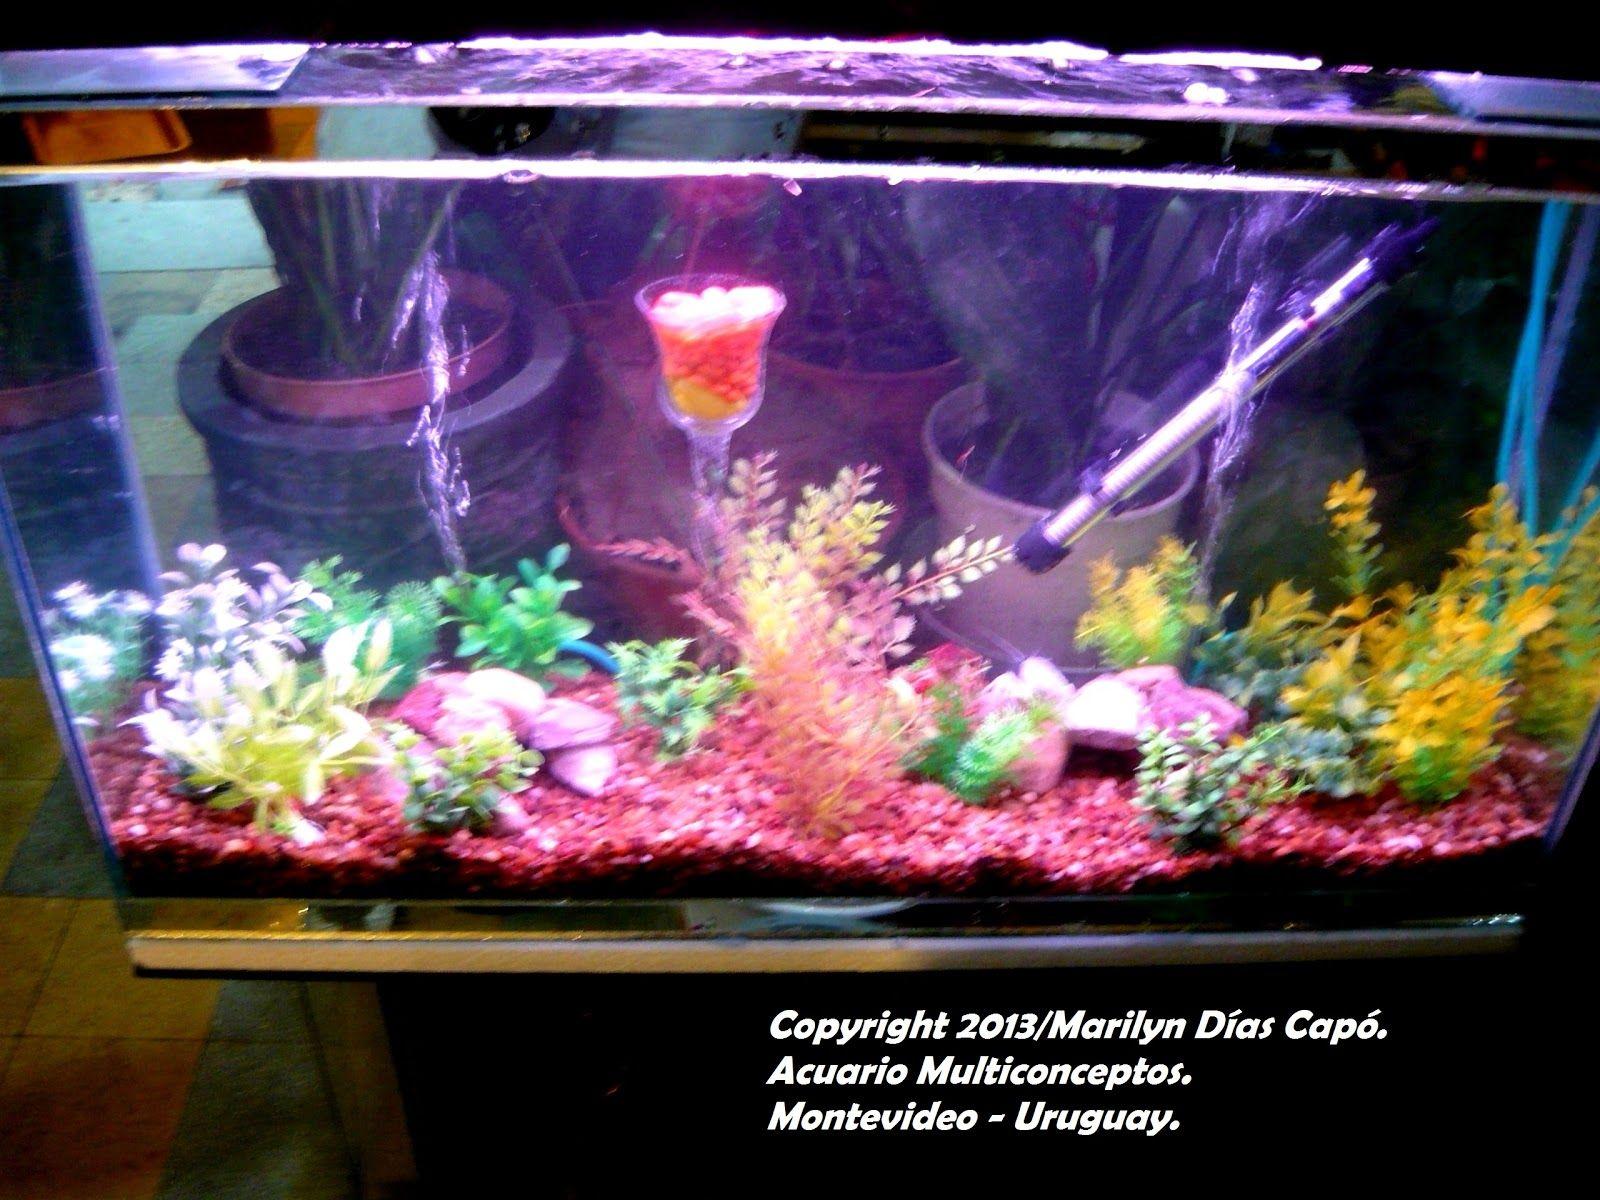 Peces tropicales de agua dulce mi primer acuario c mo for Lista de peces tropicales para acuarios